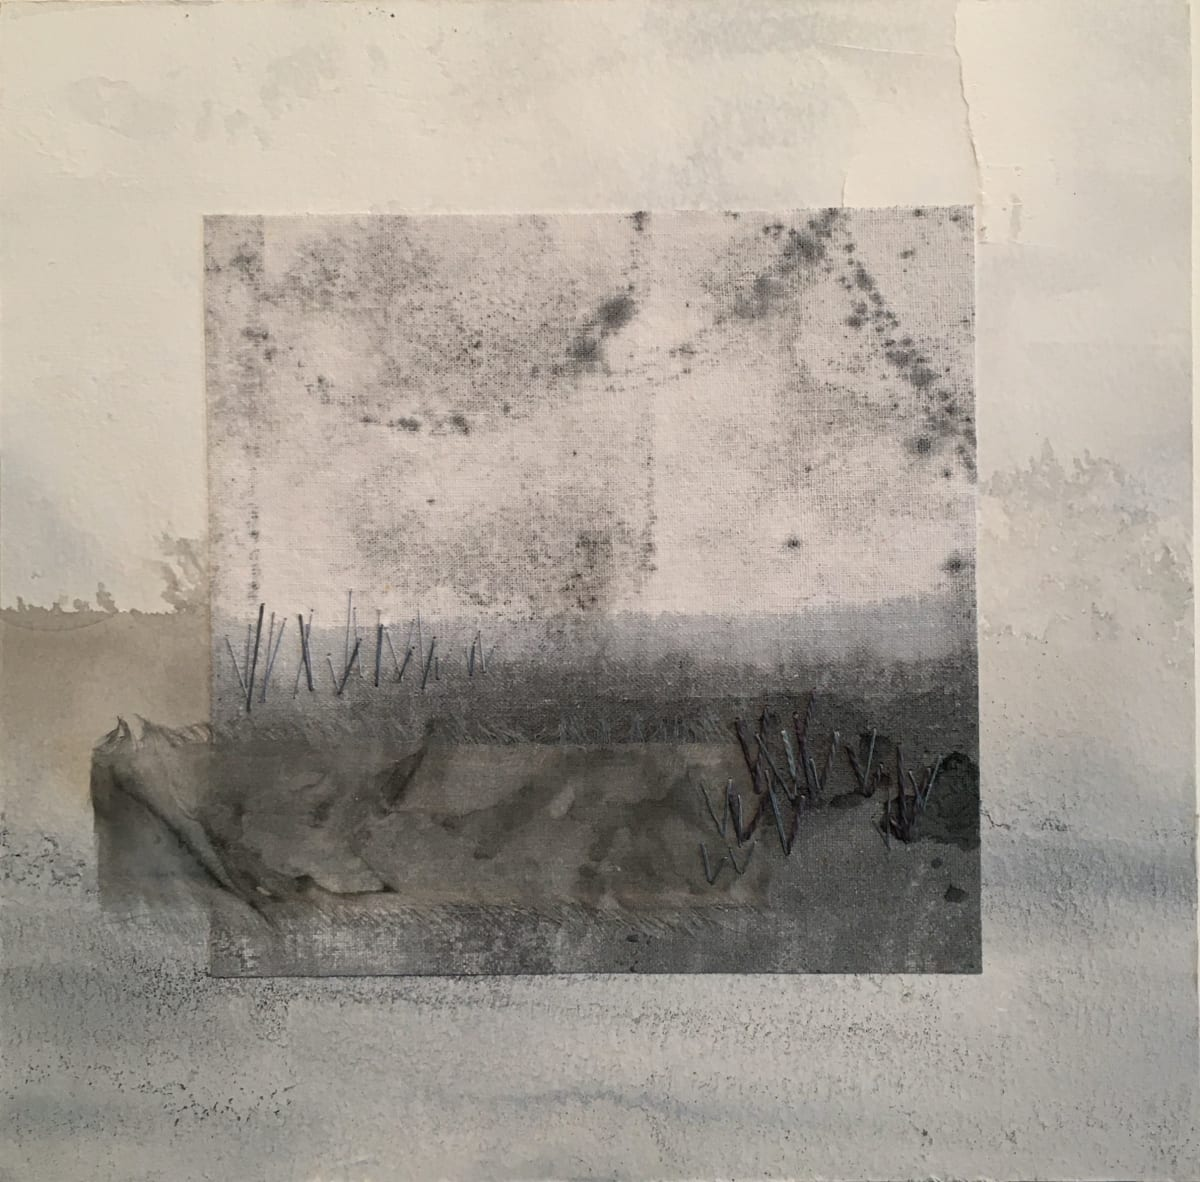 Through the Fog by Susan Purney Mark